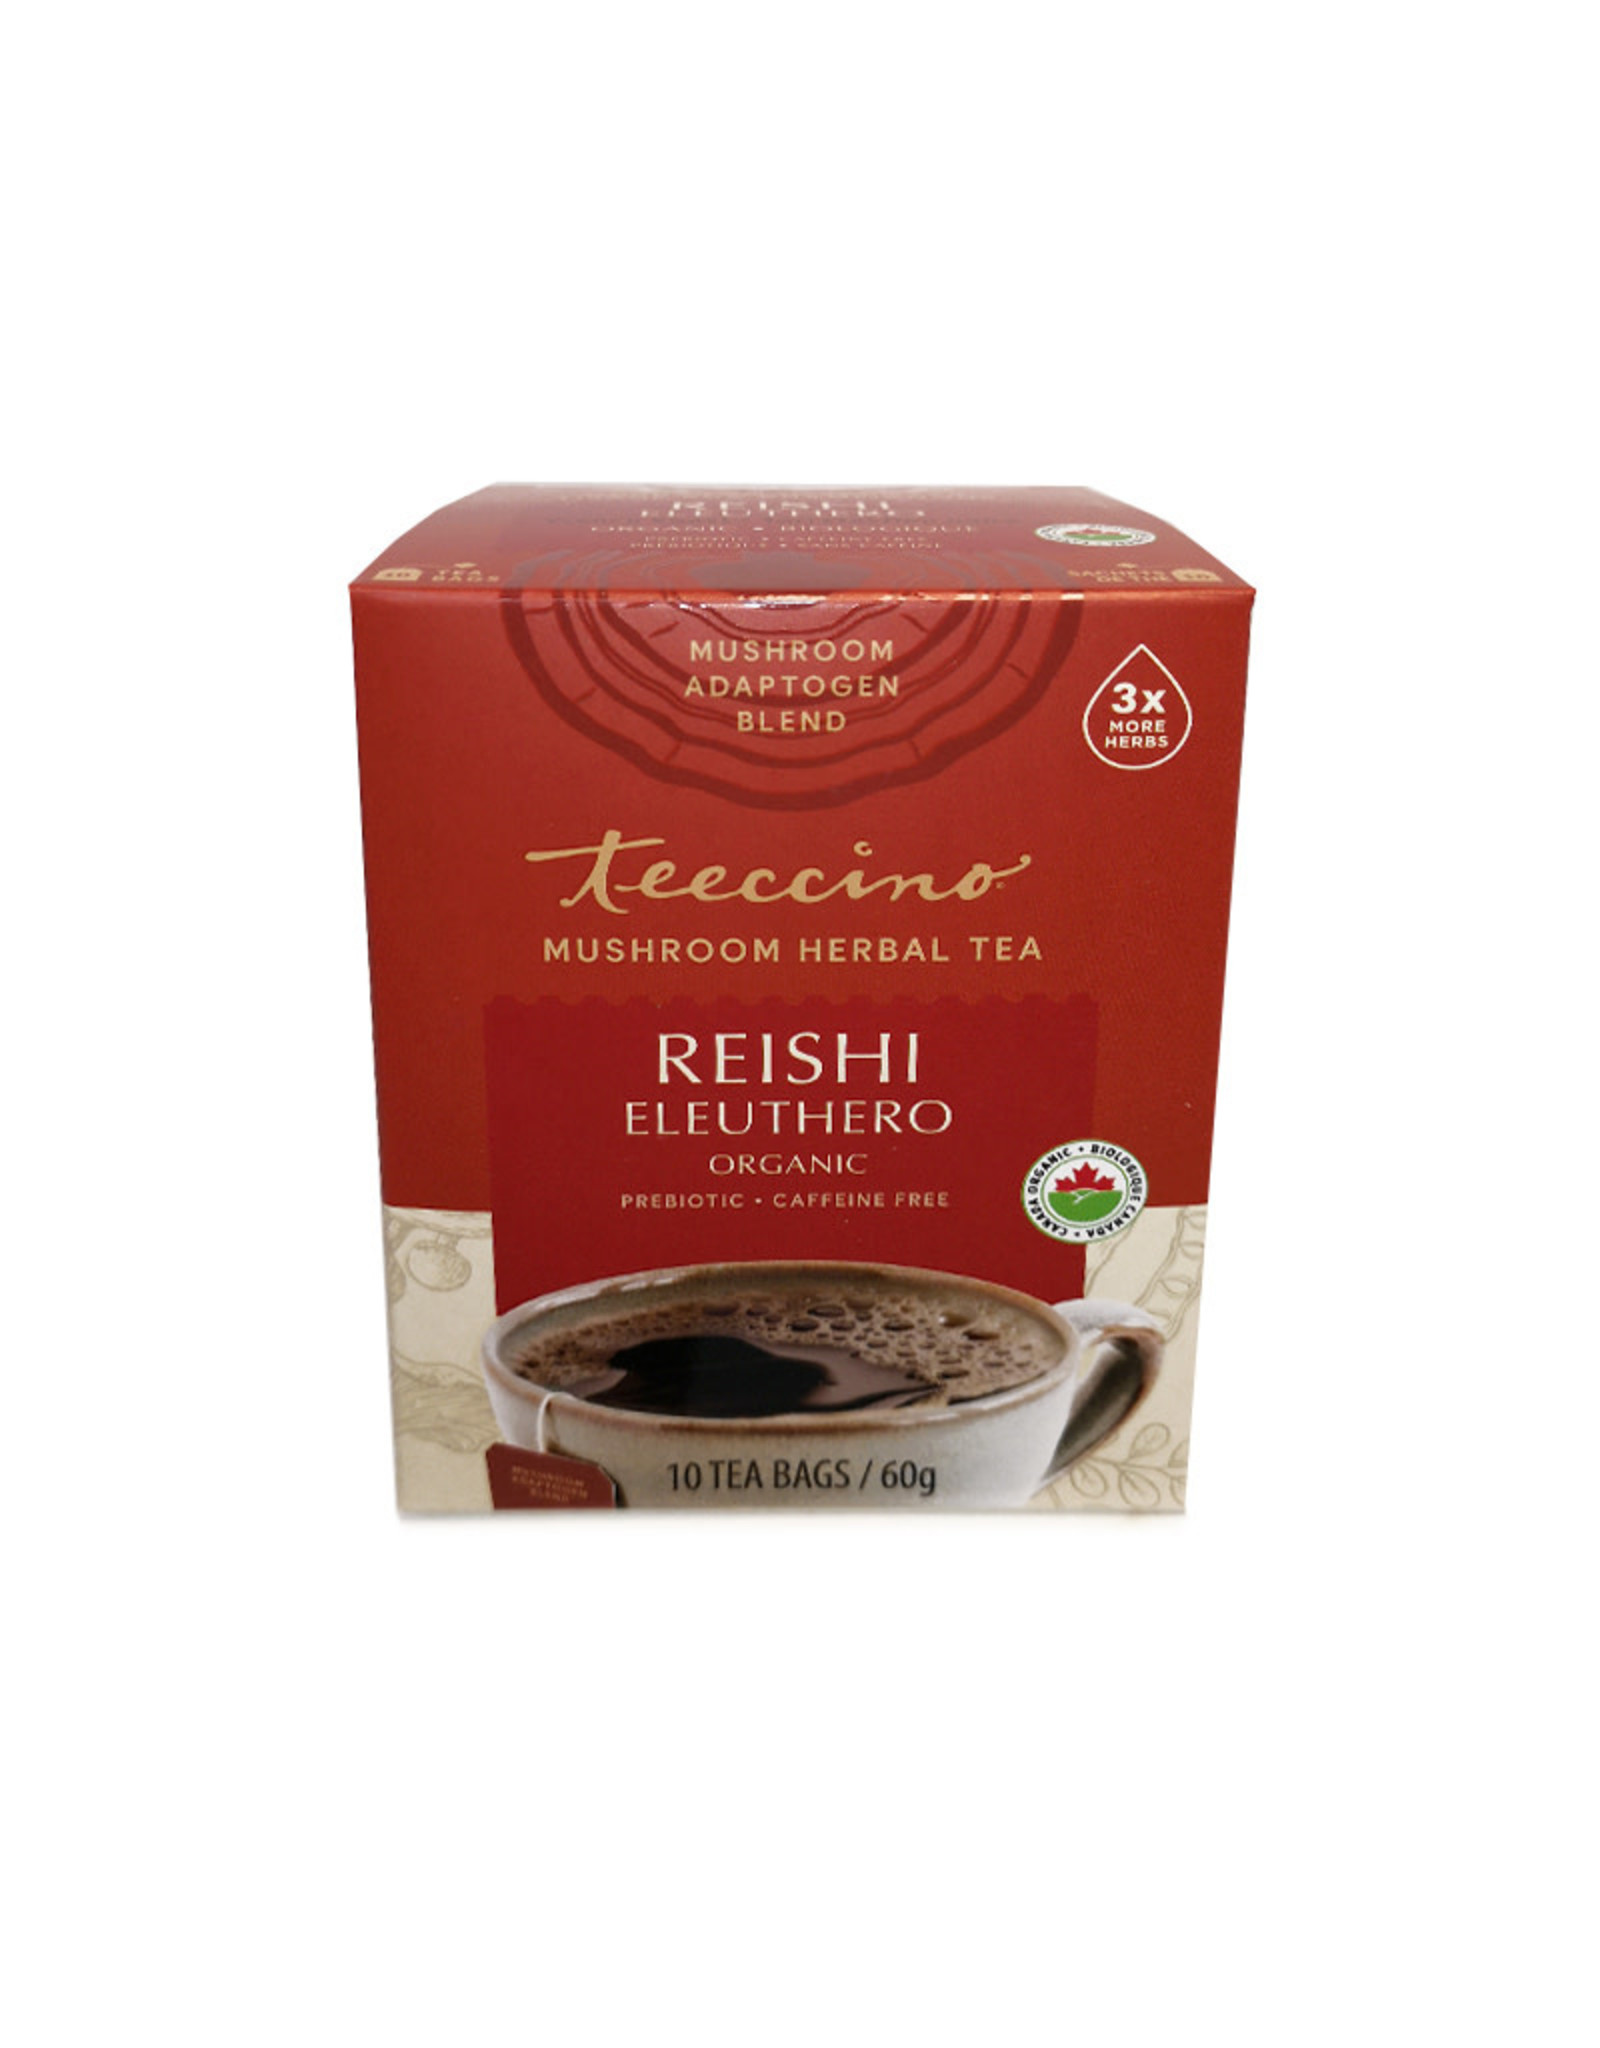 Teeccino Teeccino - Reishi Eleuthero Mushroom Tea (10bg)